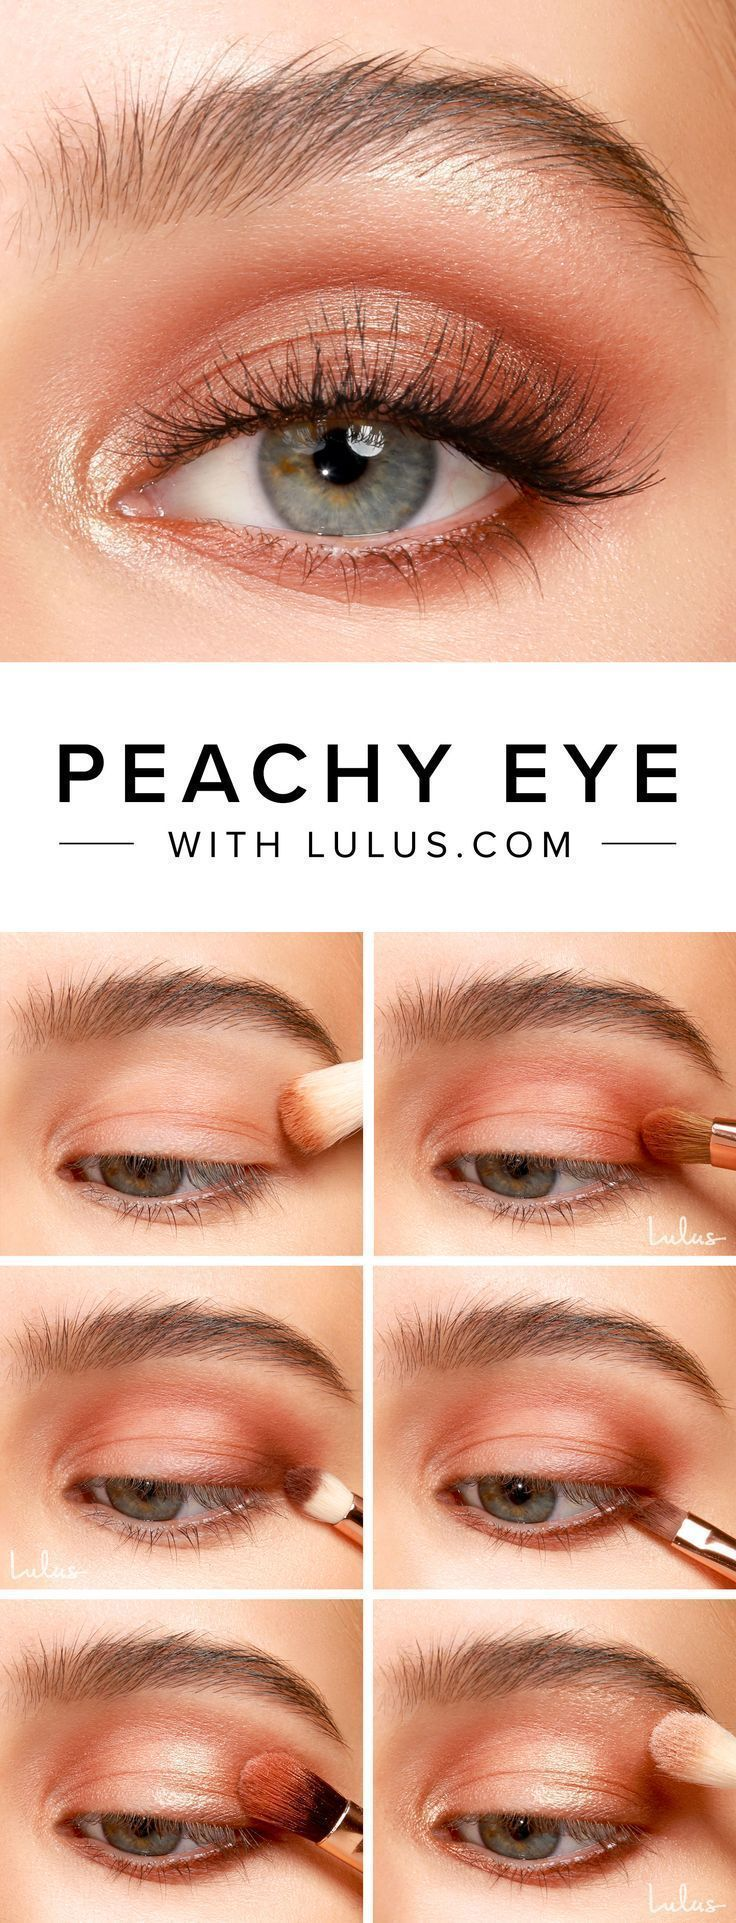 die perfekt peachy eye makeup look brides + brautjungfern sind verrückt nach d … – s t y l e – f a s h i o n